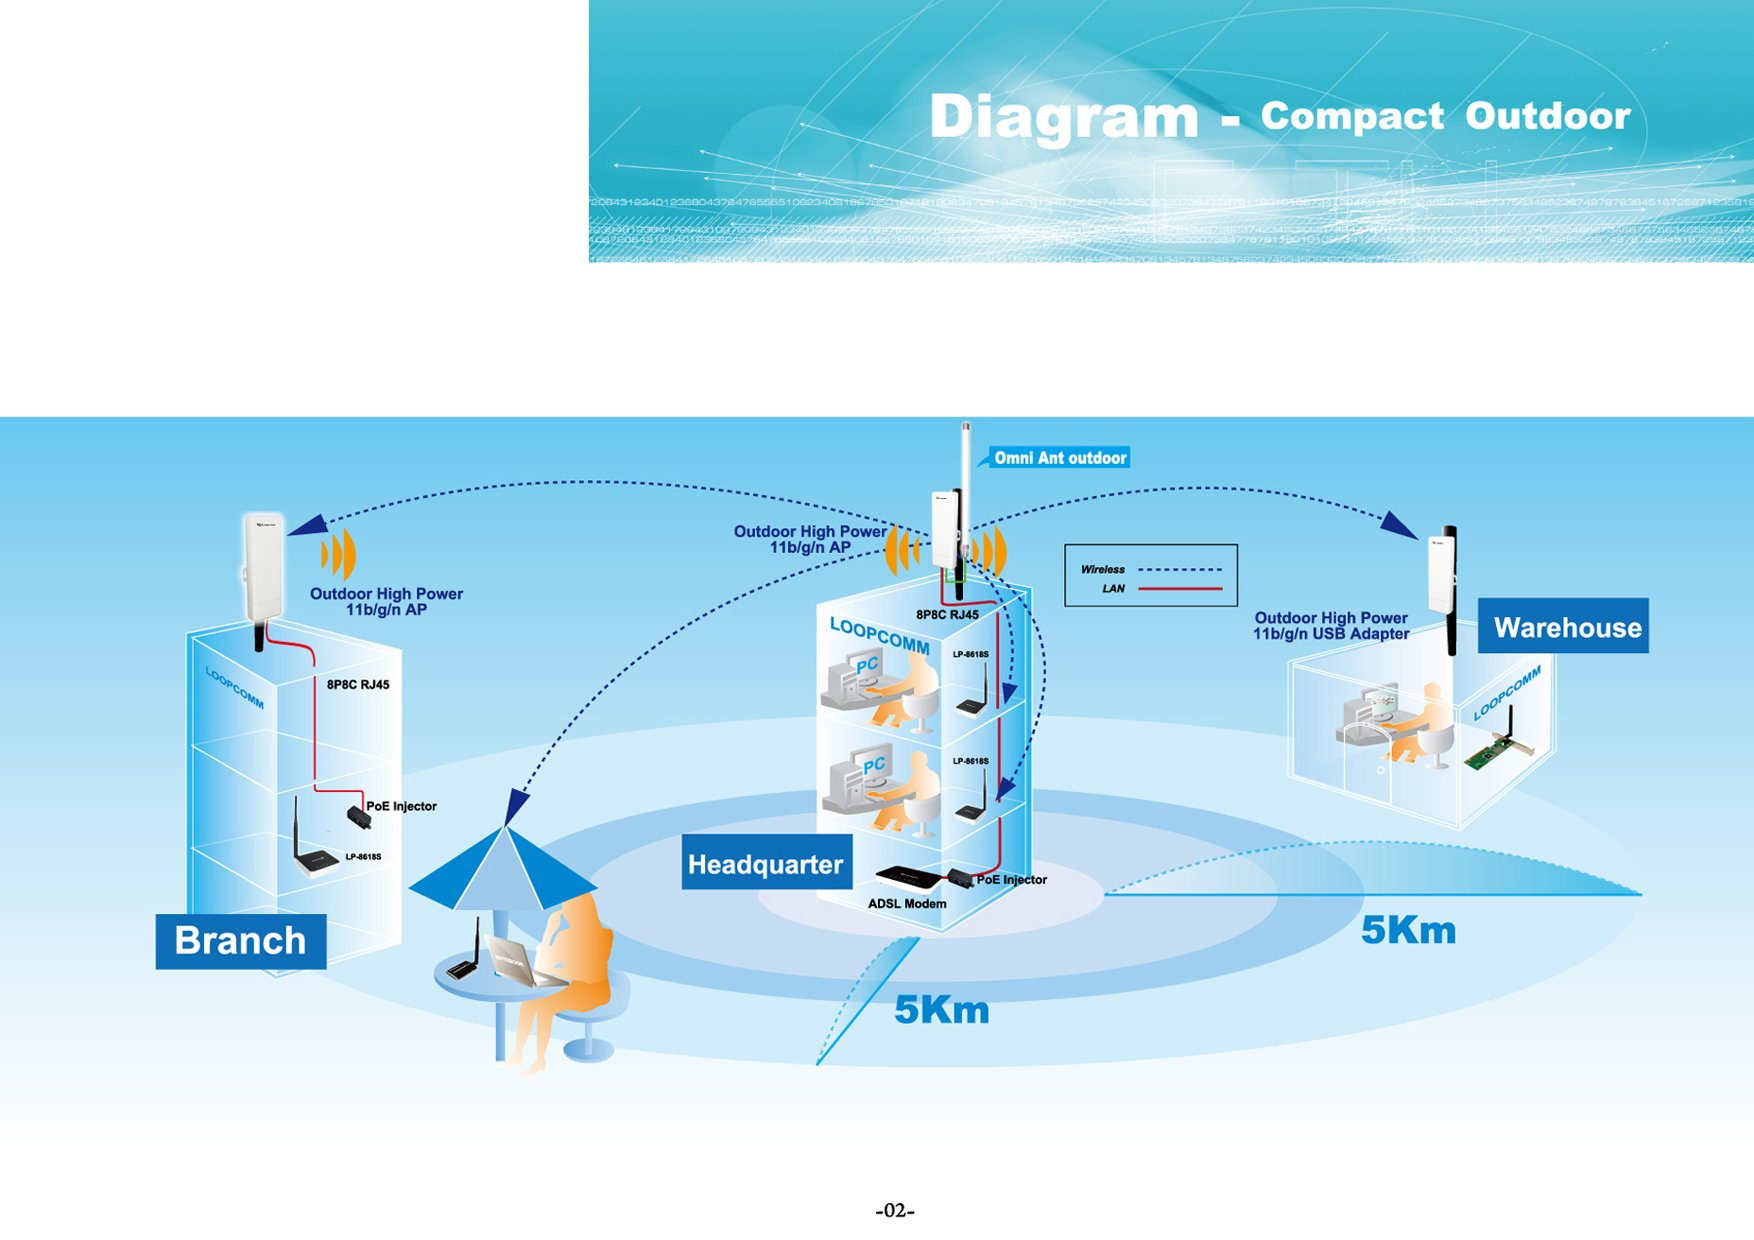 Loopcomm Outdoor 802.11b/g/n Wireless High Power CPE/AP/Router/Clint/Bridge/Repeater (LP-7316K) by Loopcomm (Image #6)